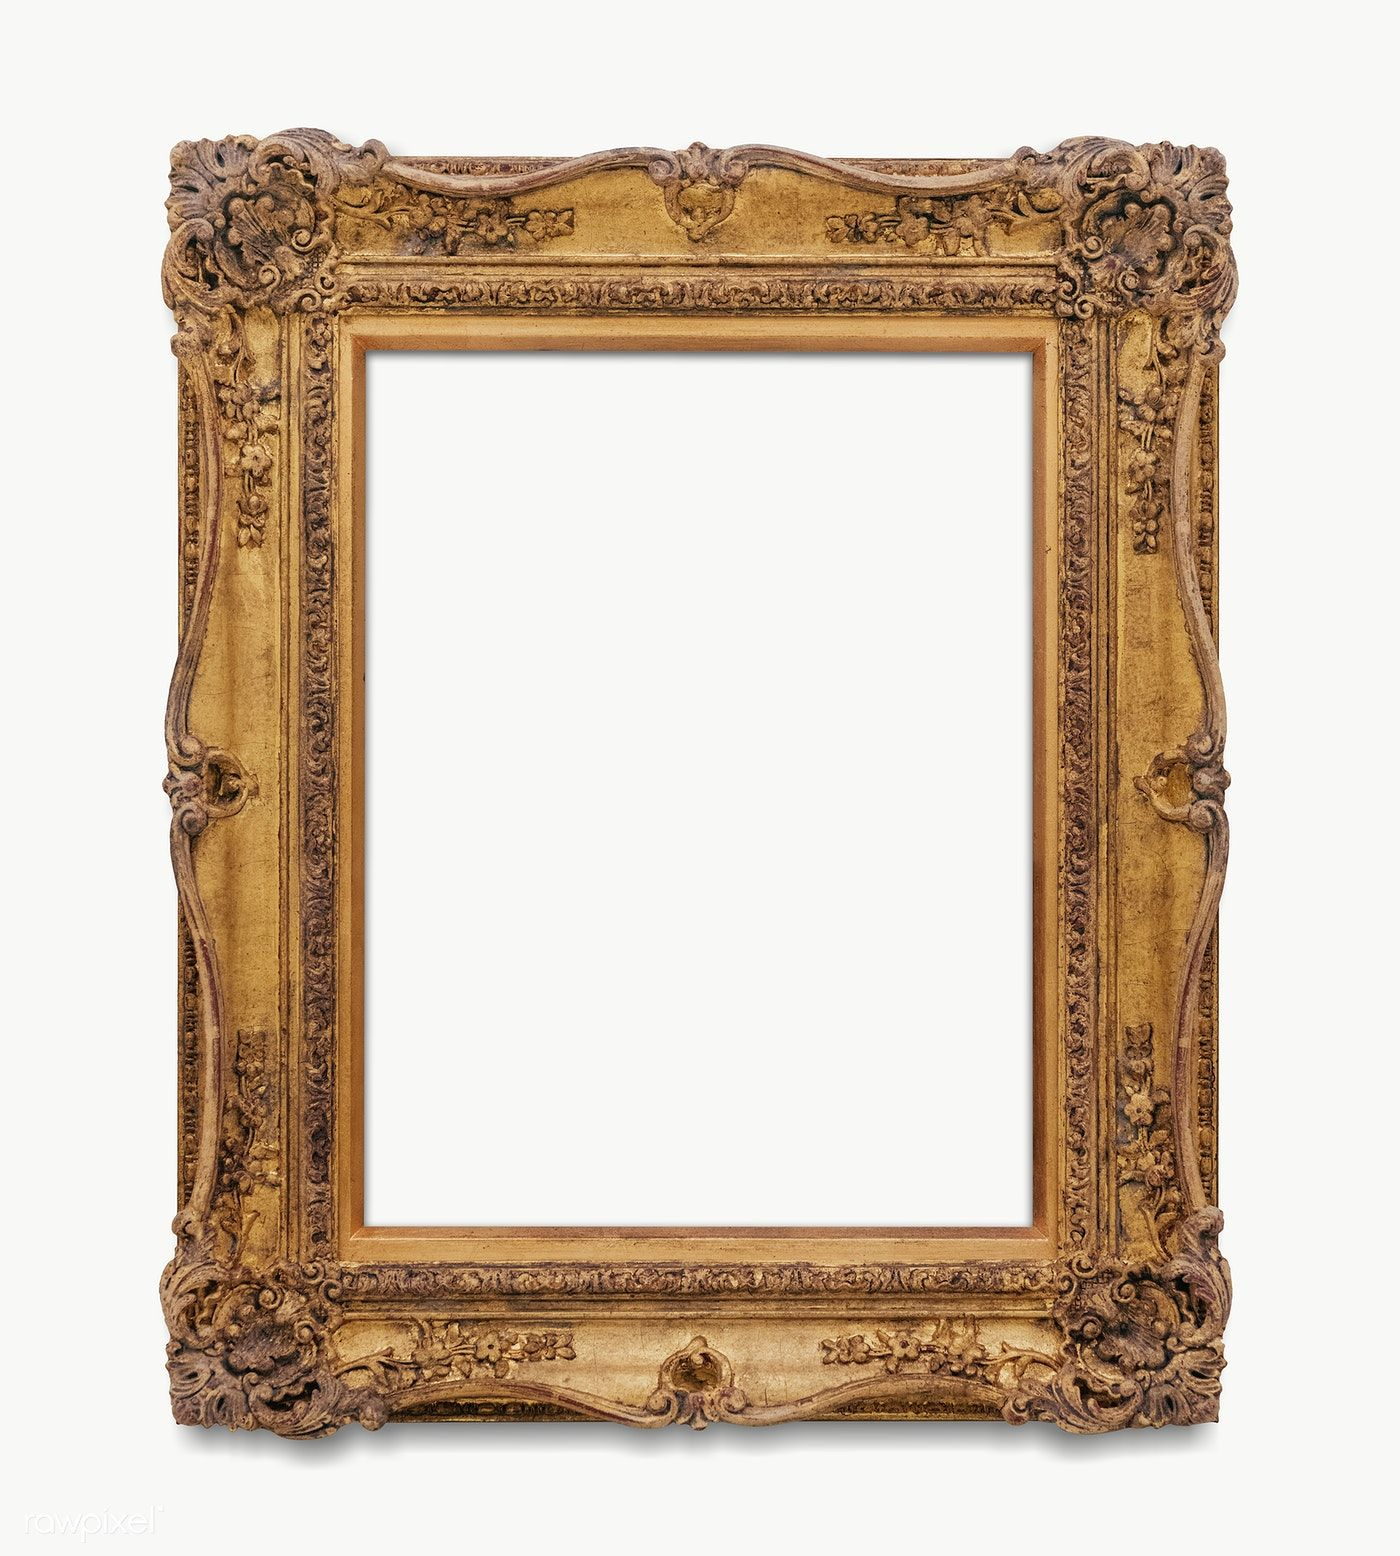 Download Premium Png Of Vintage Rectangle Gold Picture Frame Transparent Gold Picture Frames Pink Picture Frames Blue Picture Frames